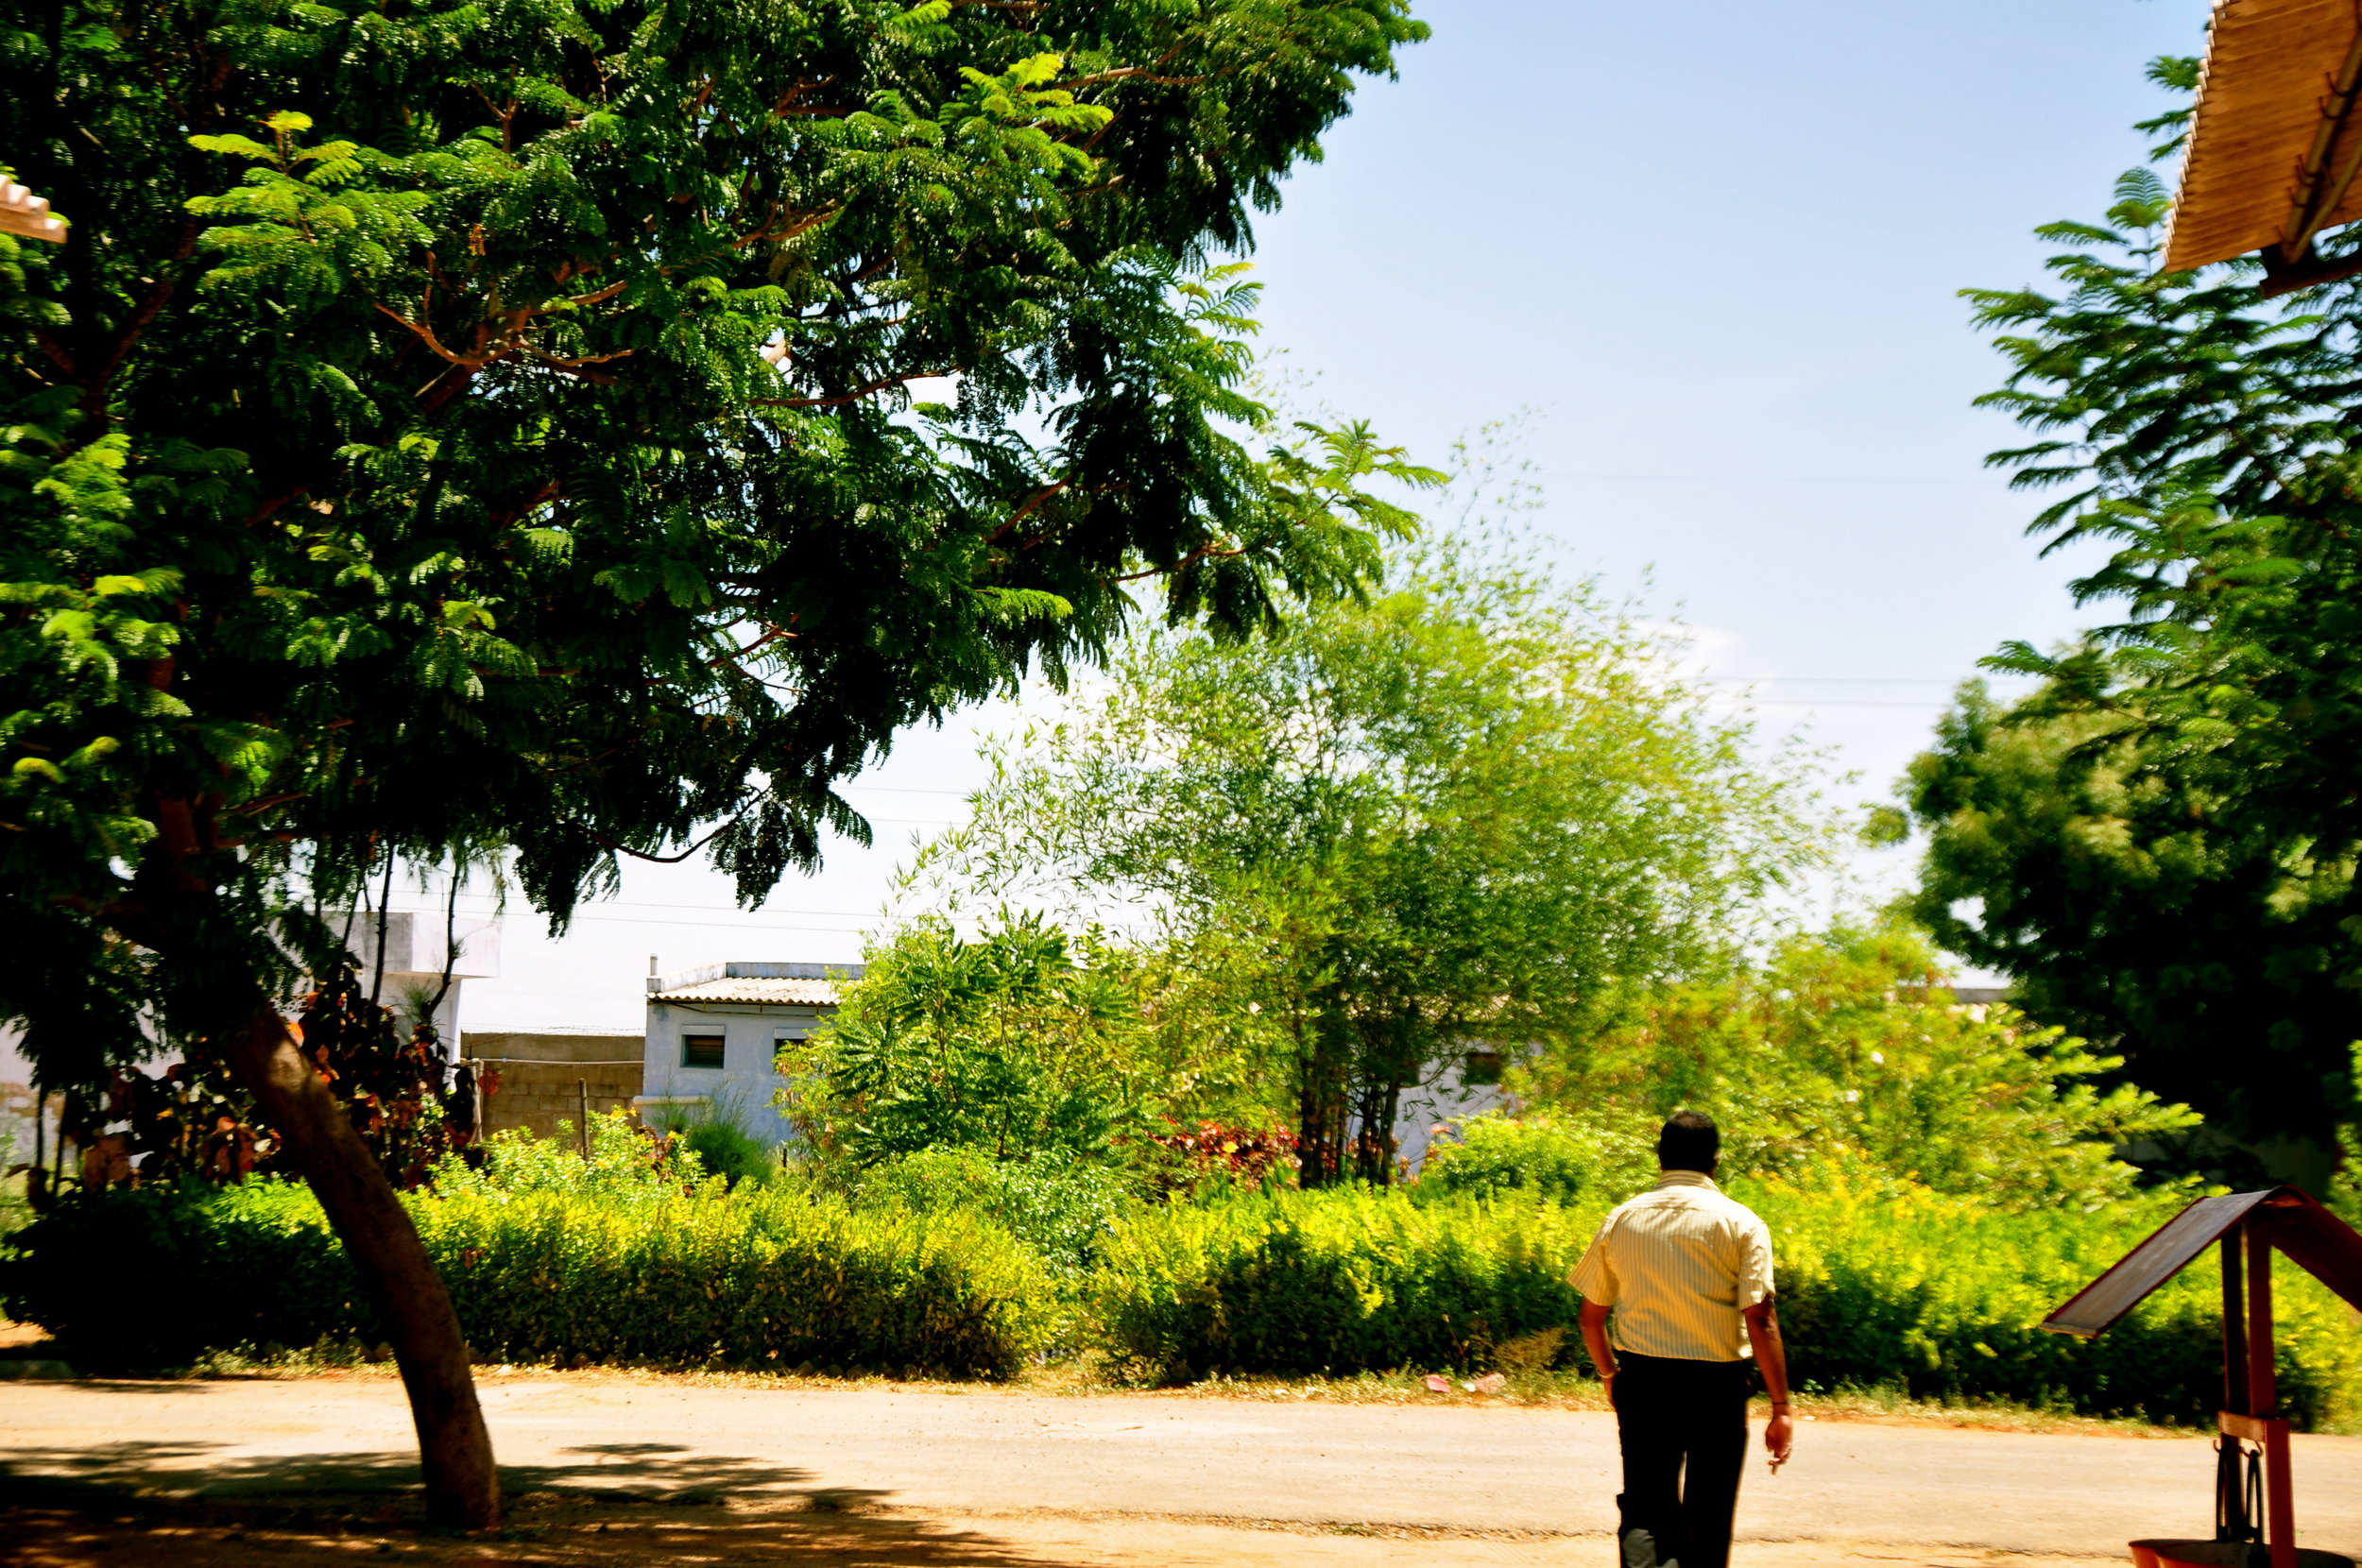 Green environment.JPG